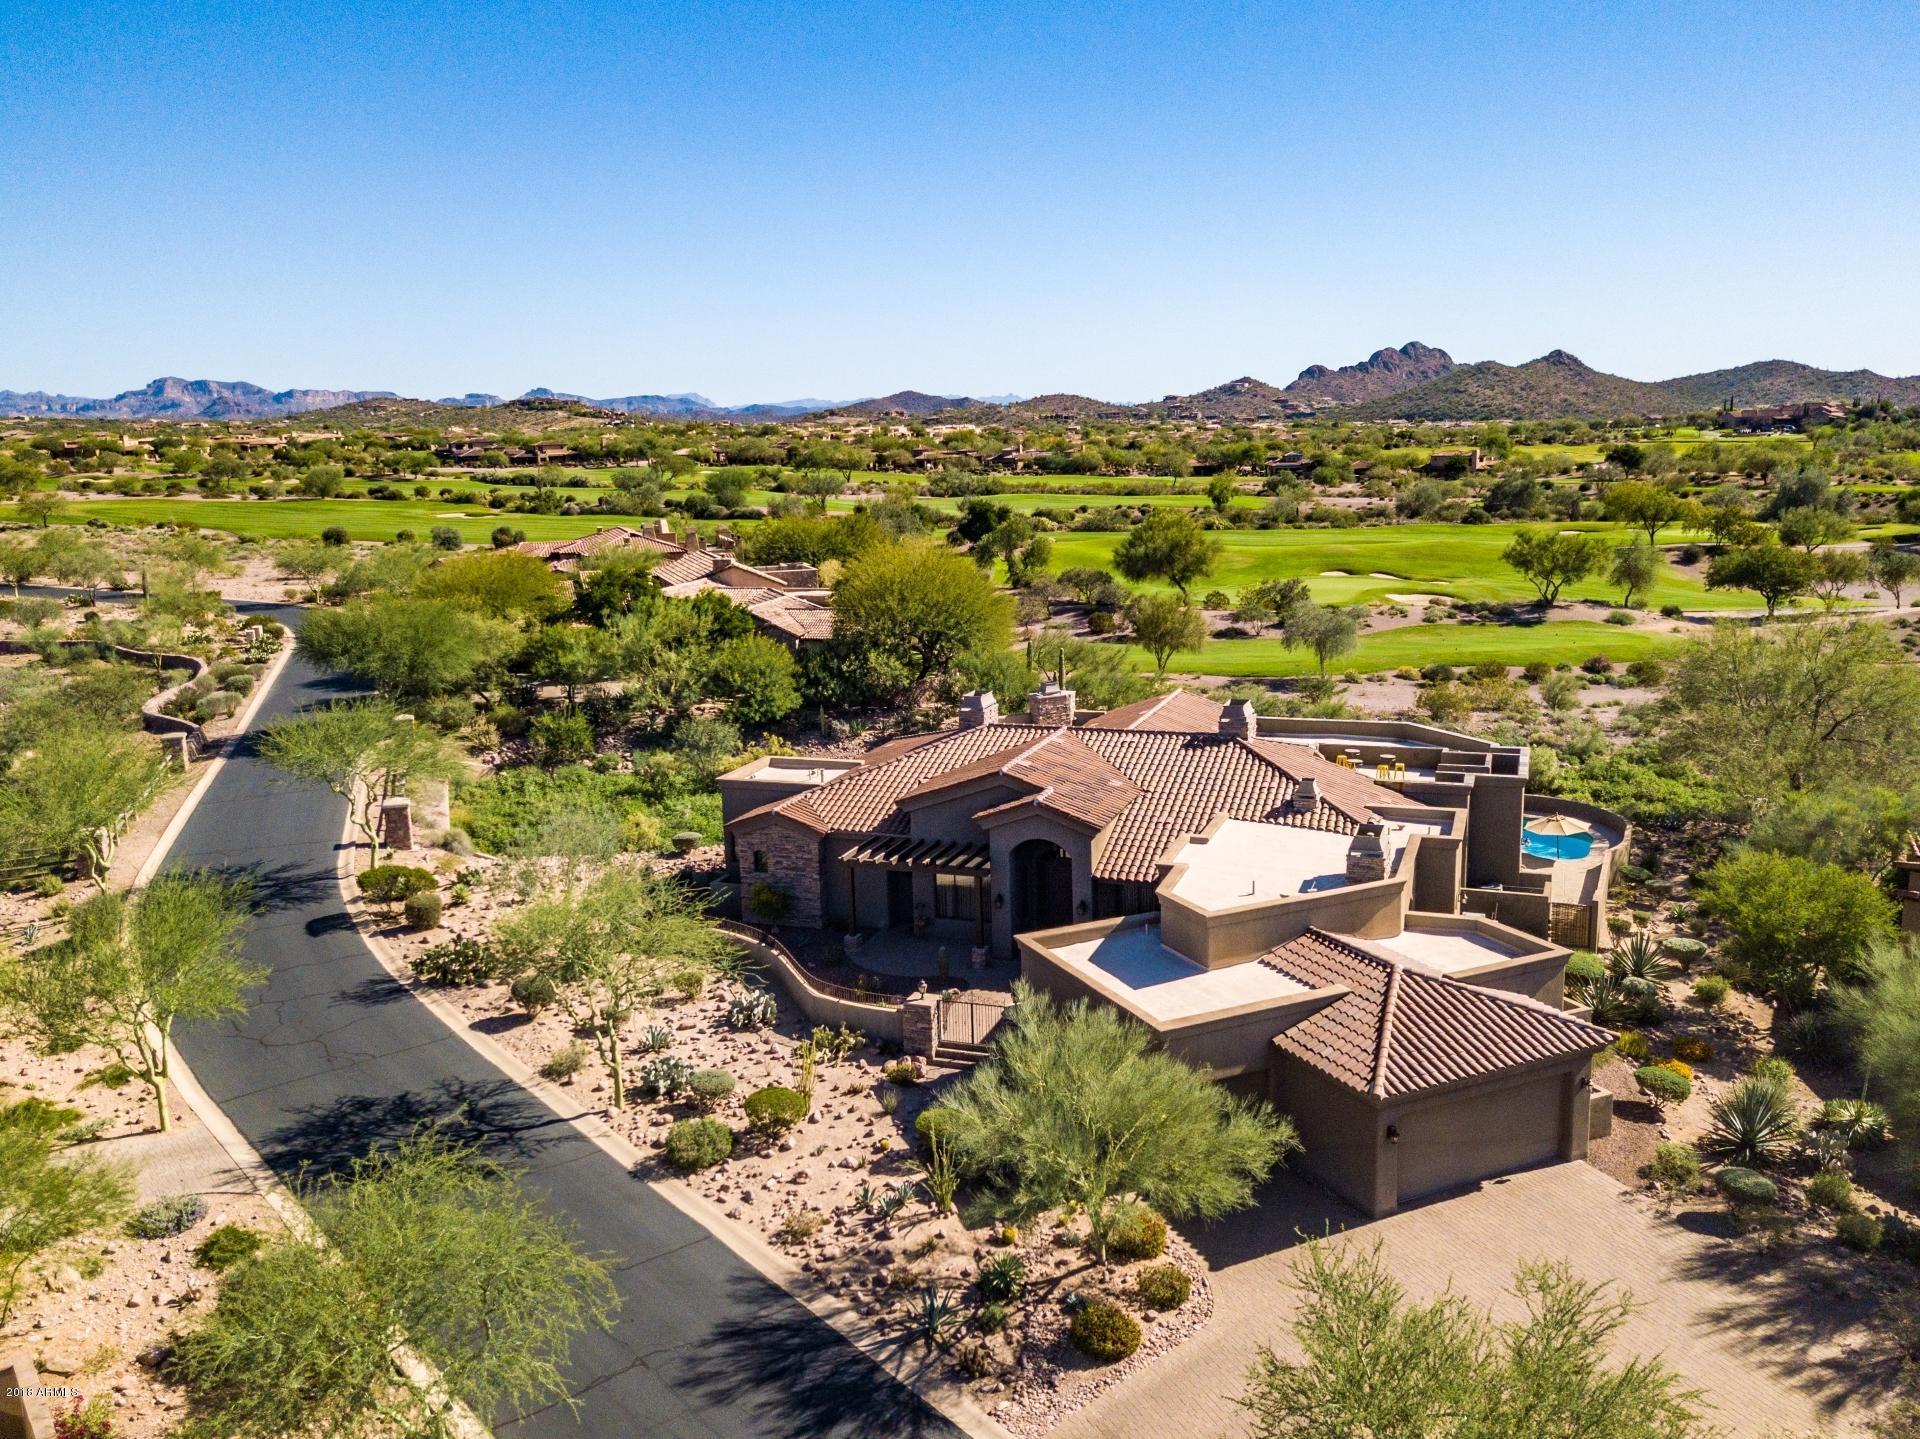 MLS 5843296 7591 E USERY PASS Trail, Gold Canyon, AZ Gold Canyon AZ Luxury